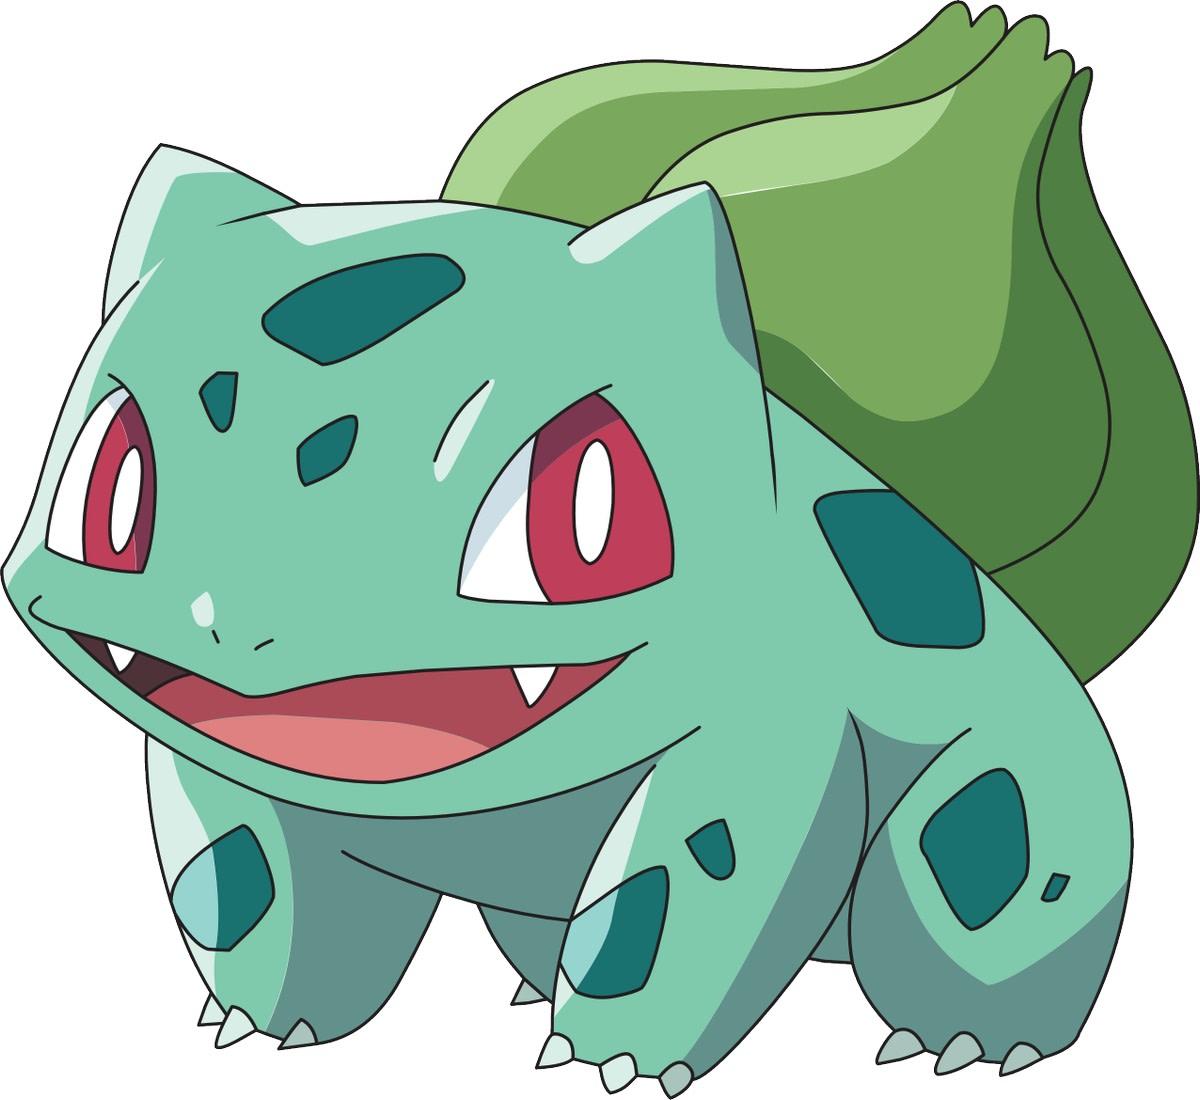 Pokémon: Bulbasaur Nicknames